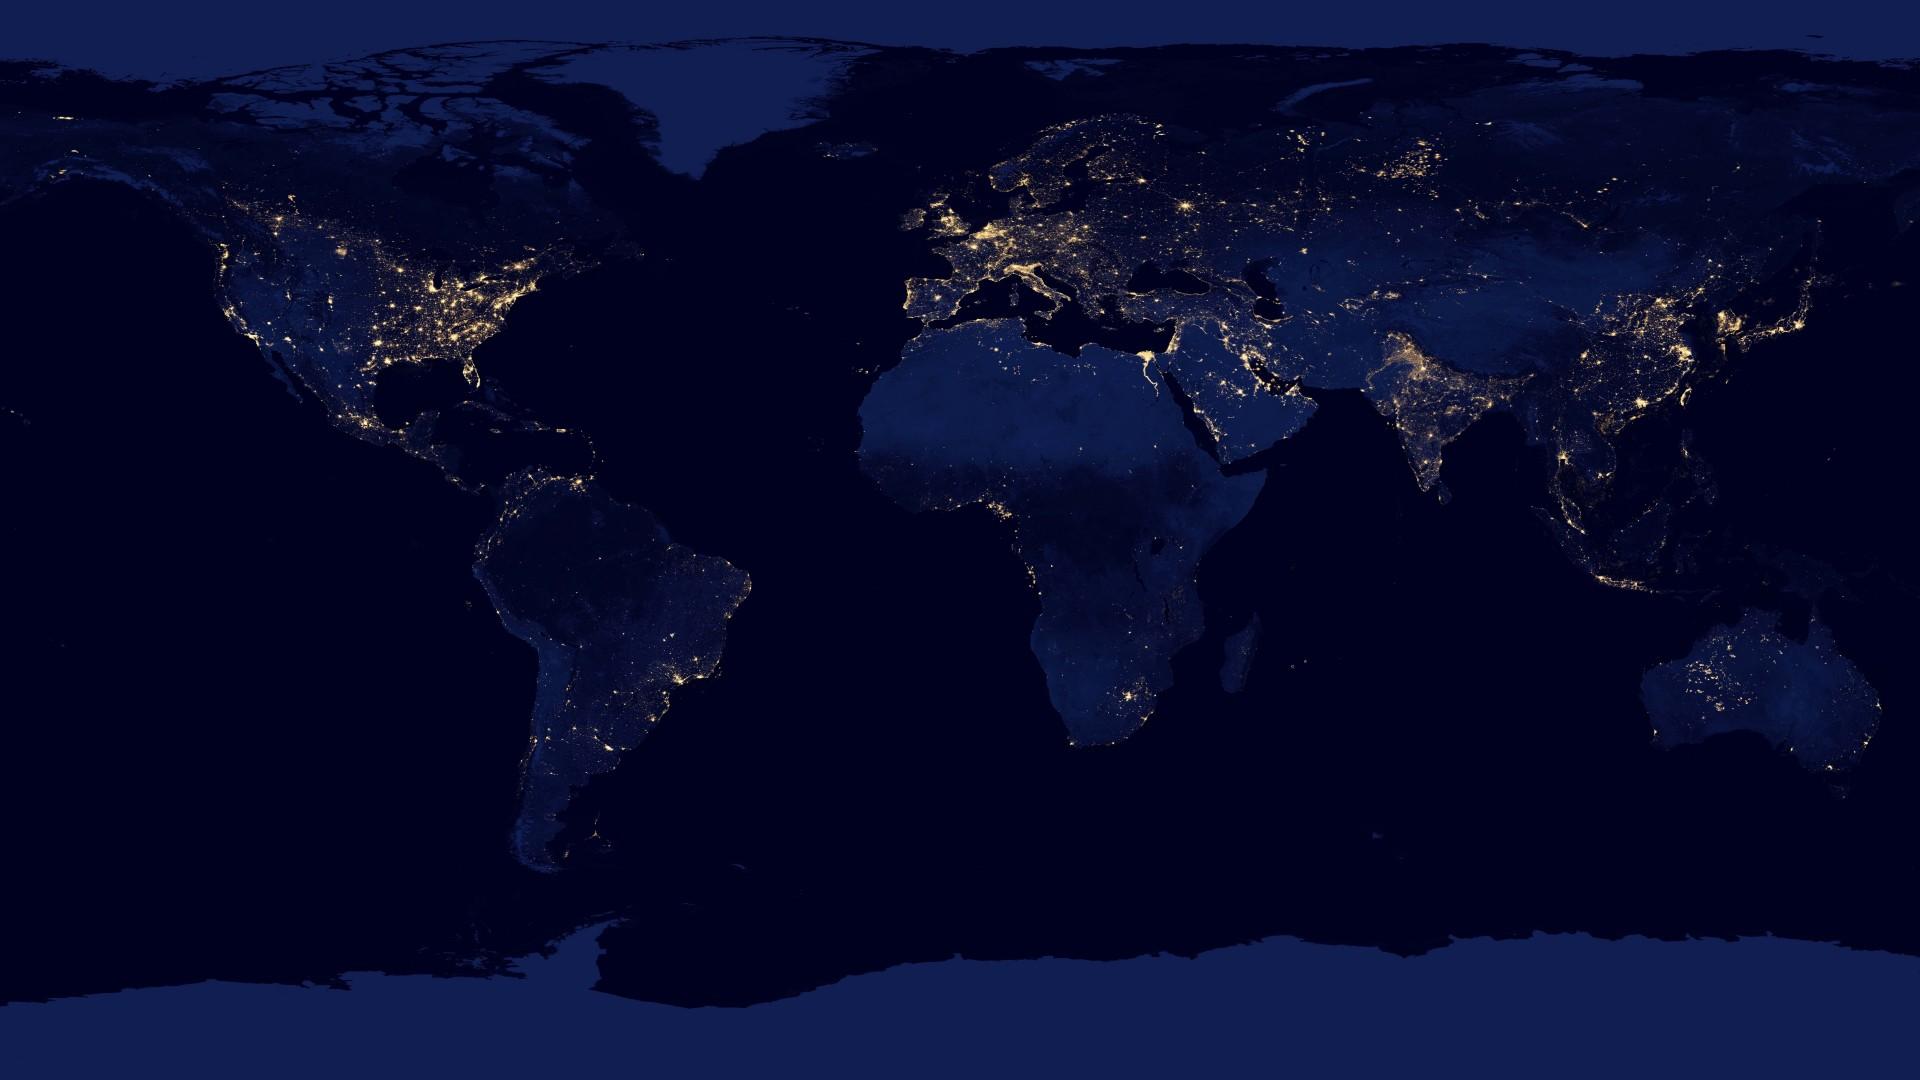 Wallpaper night Earth planet map NASA lights Earth at night 1920x1080